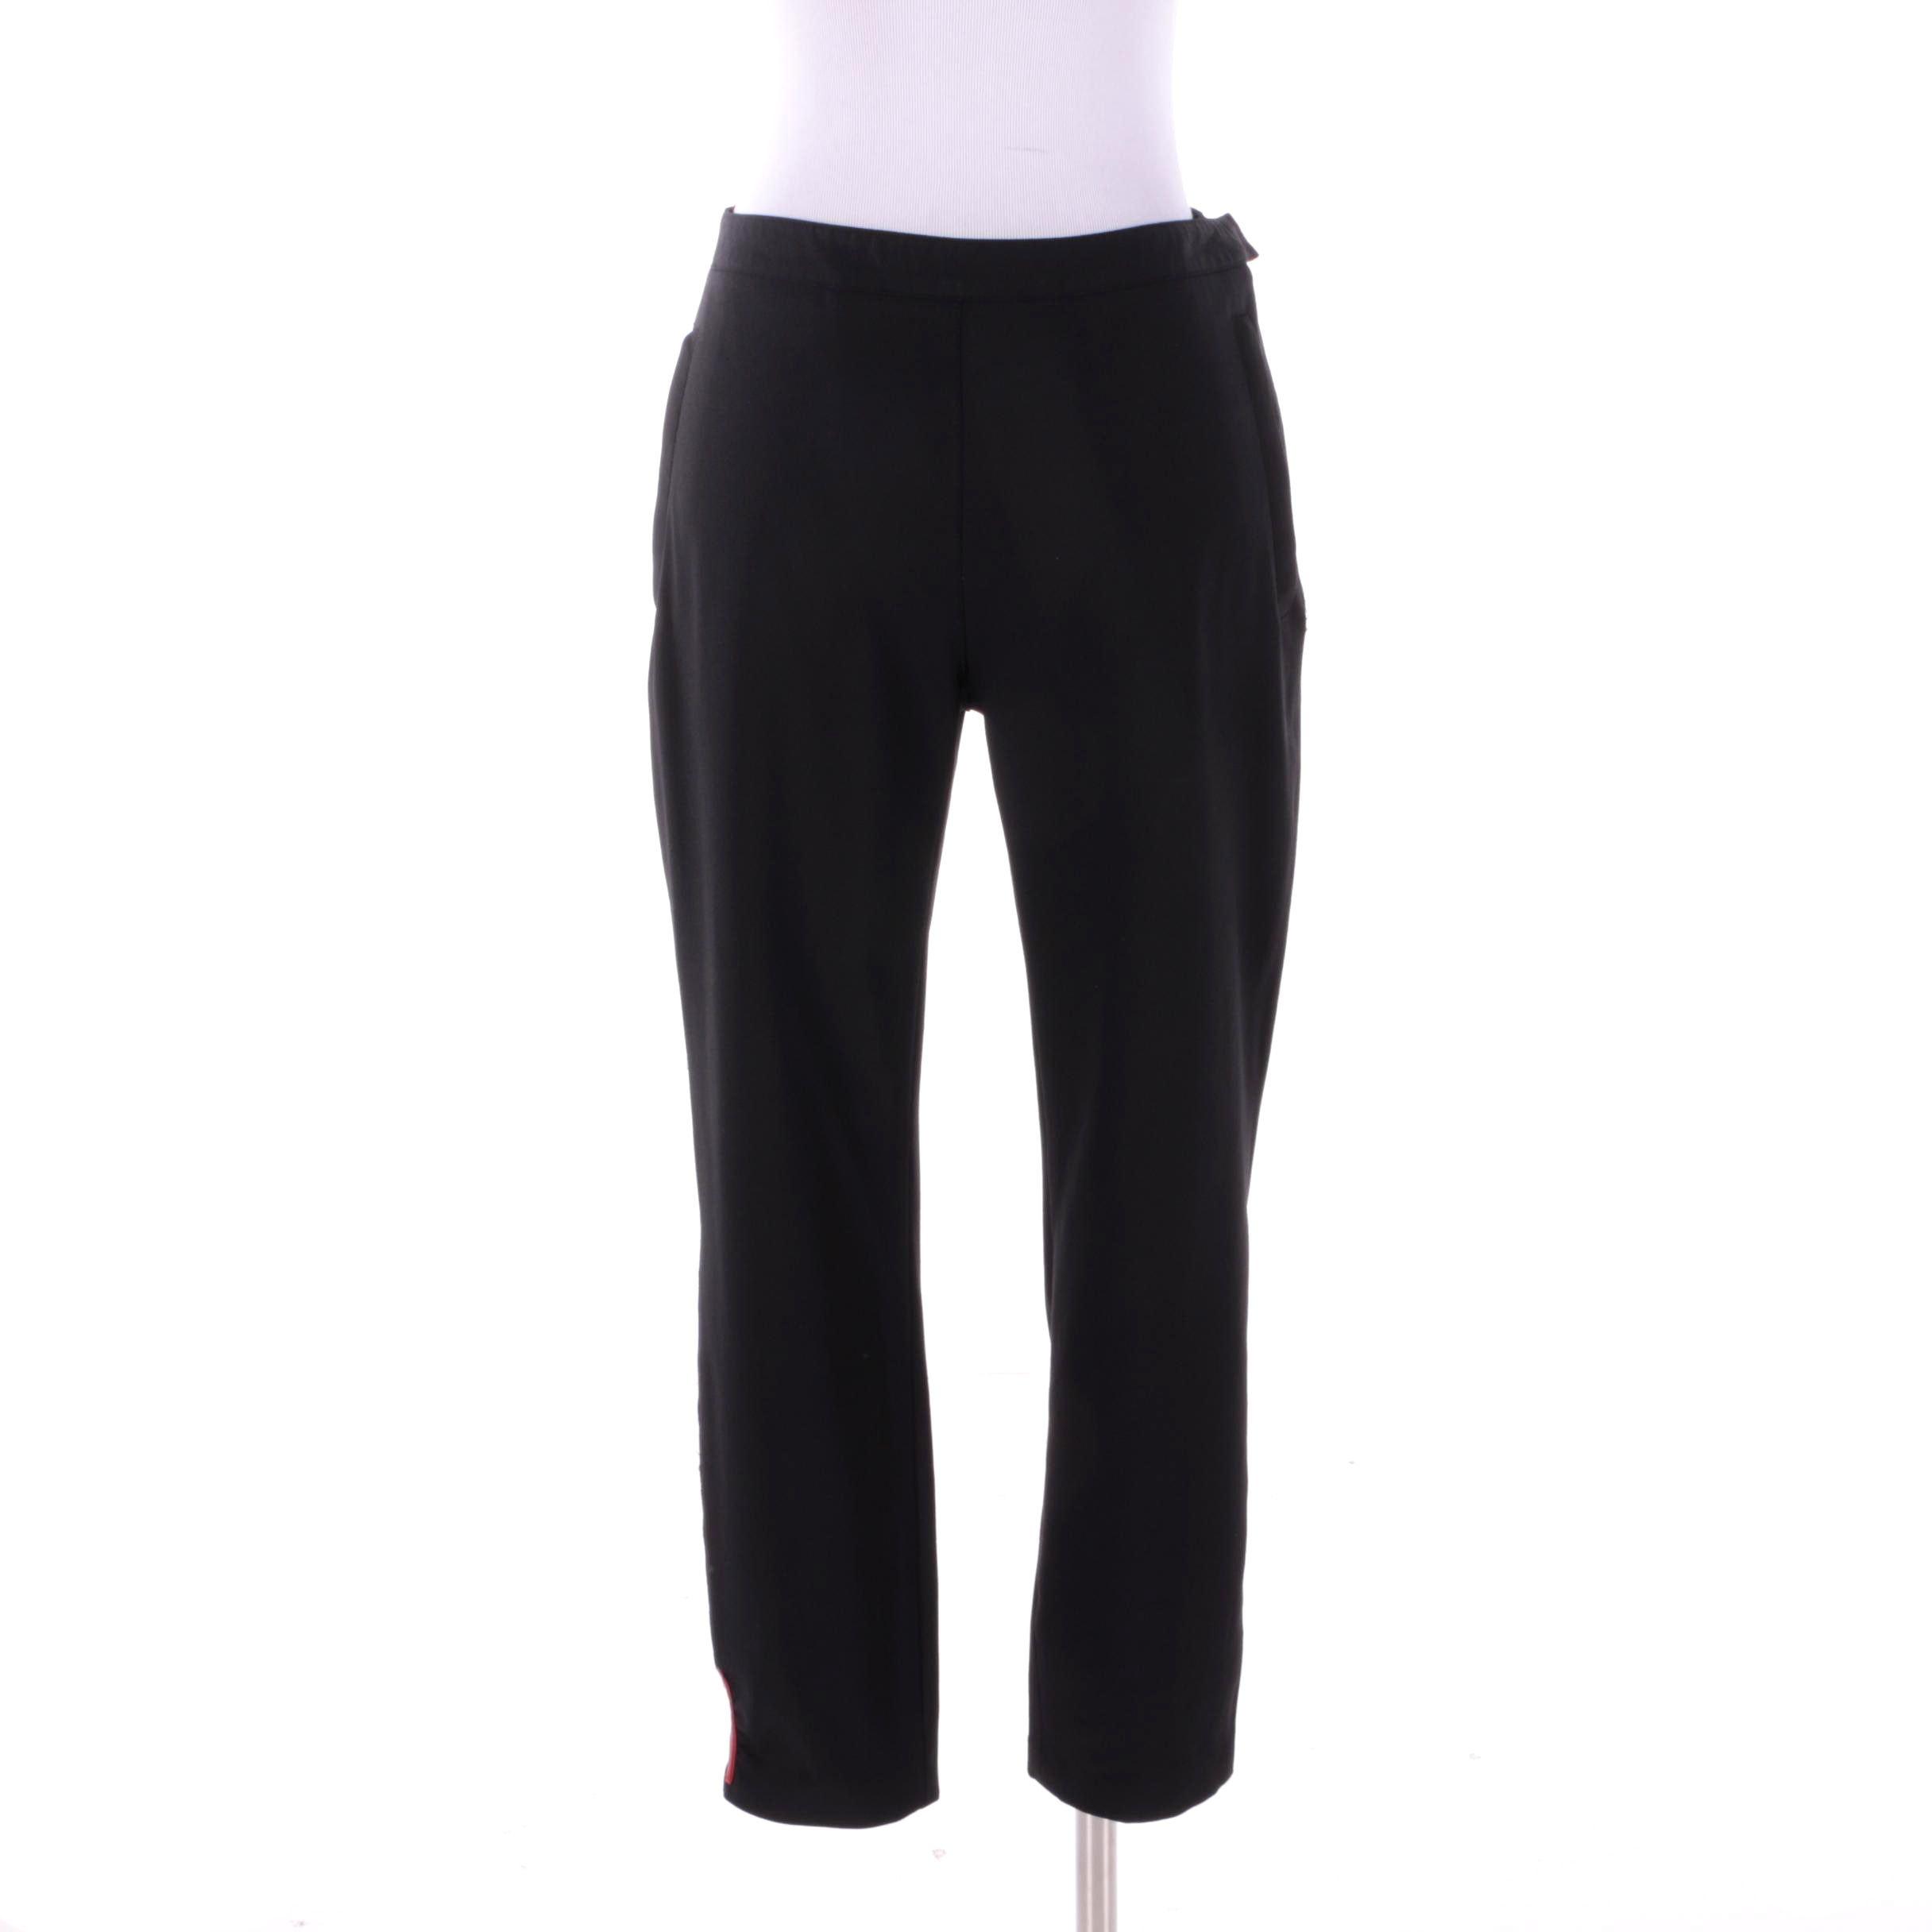 Women's Prada Black Nylon Blend Trousers